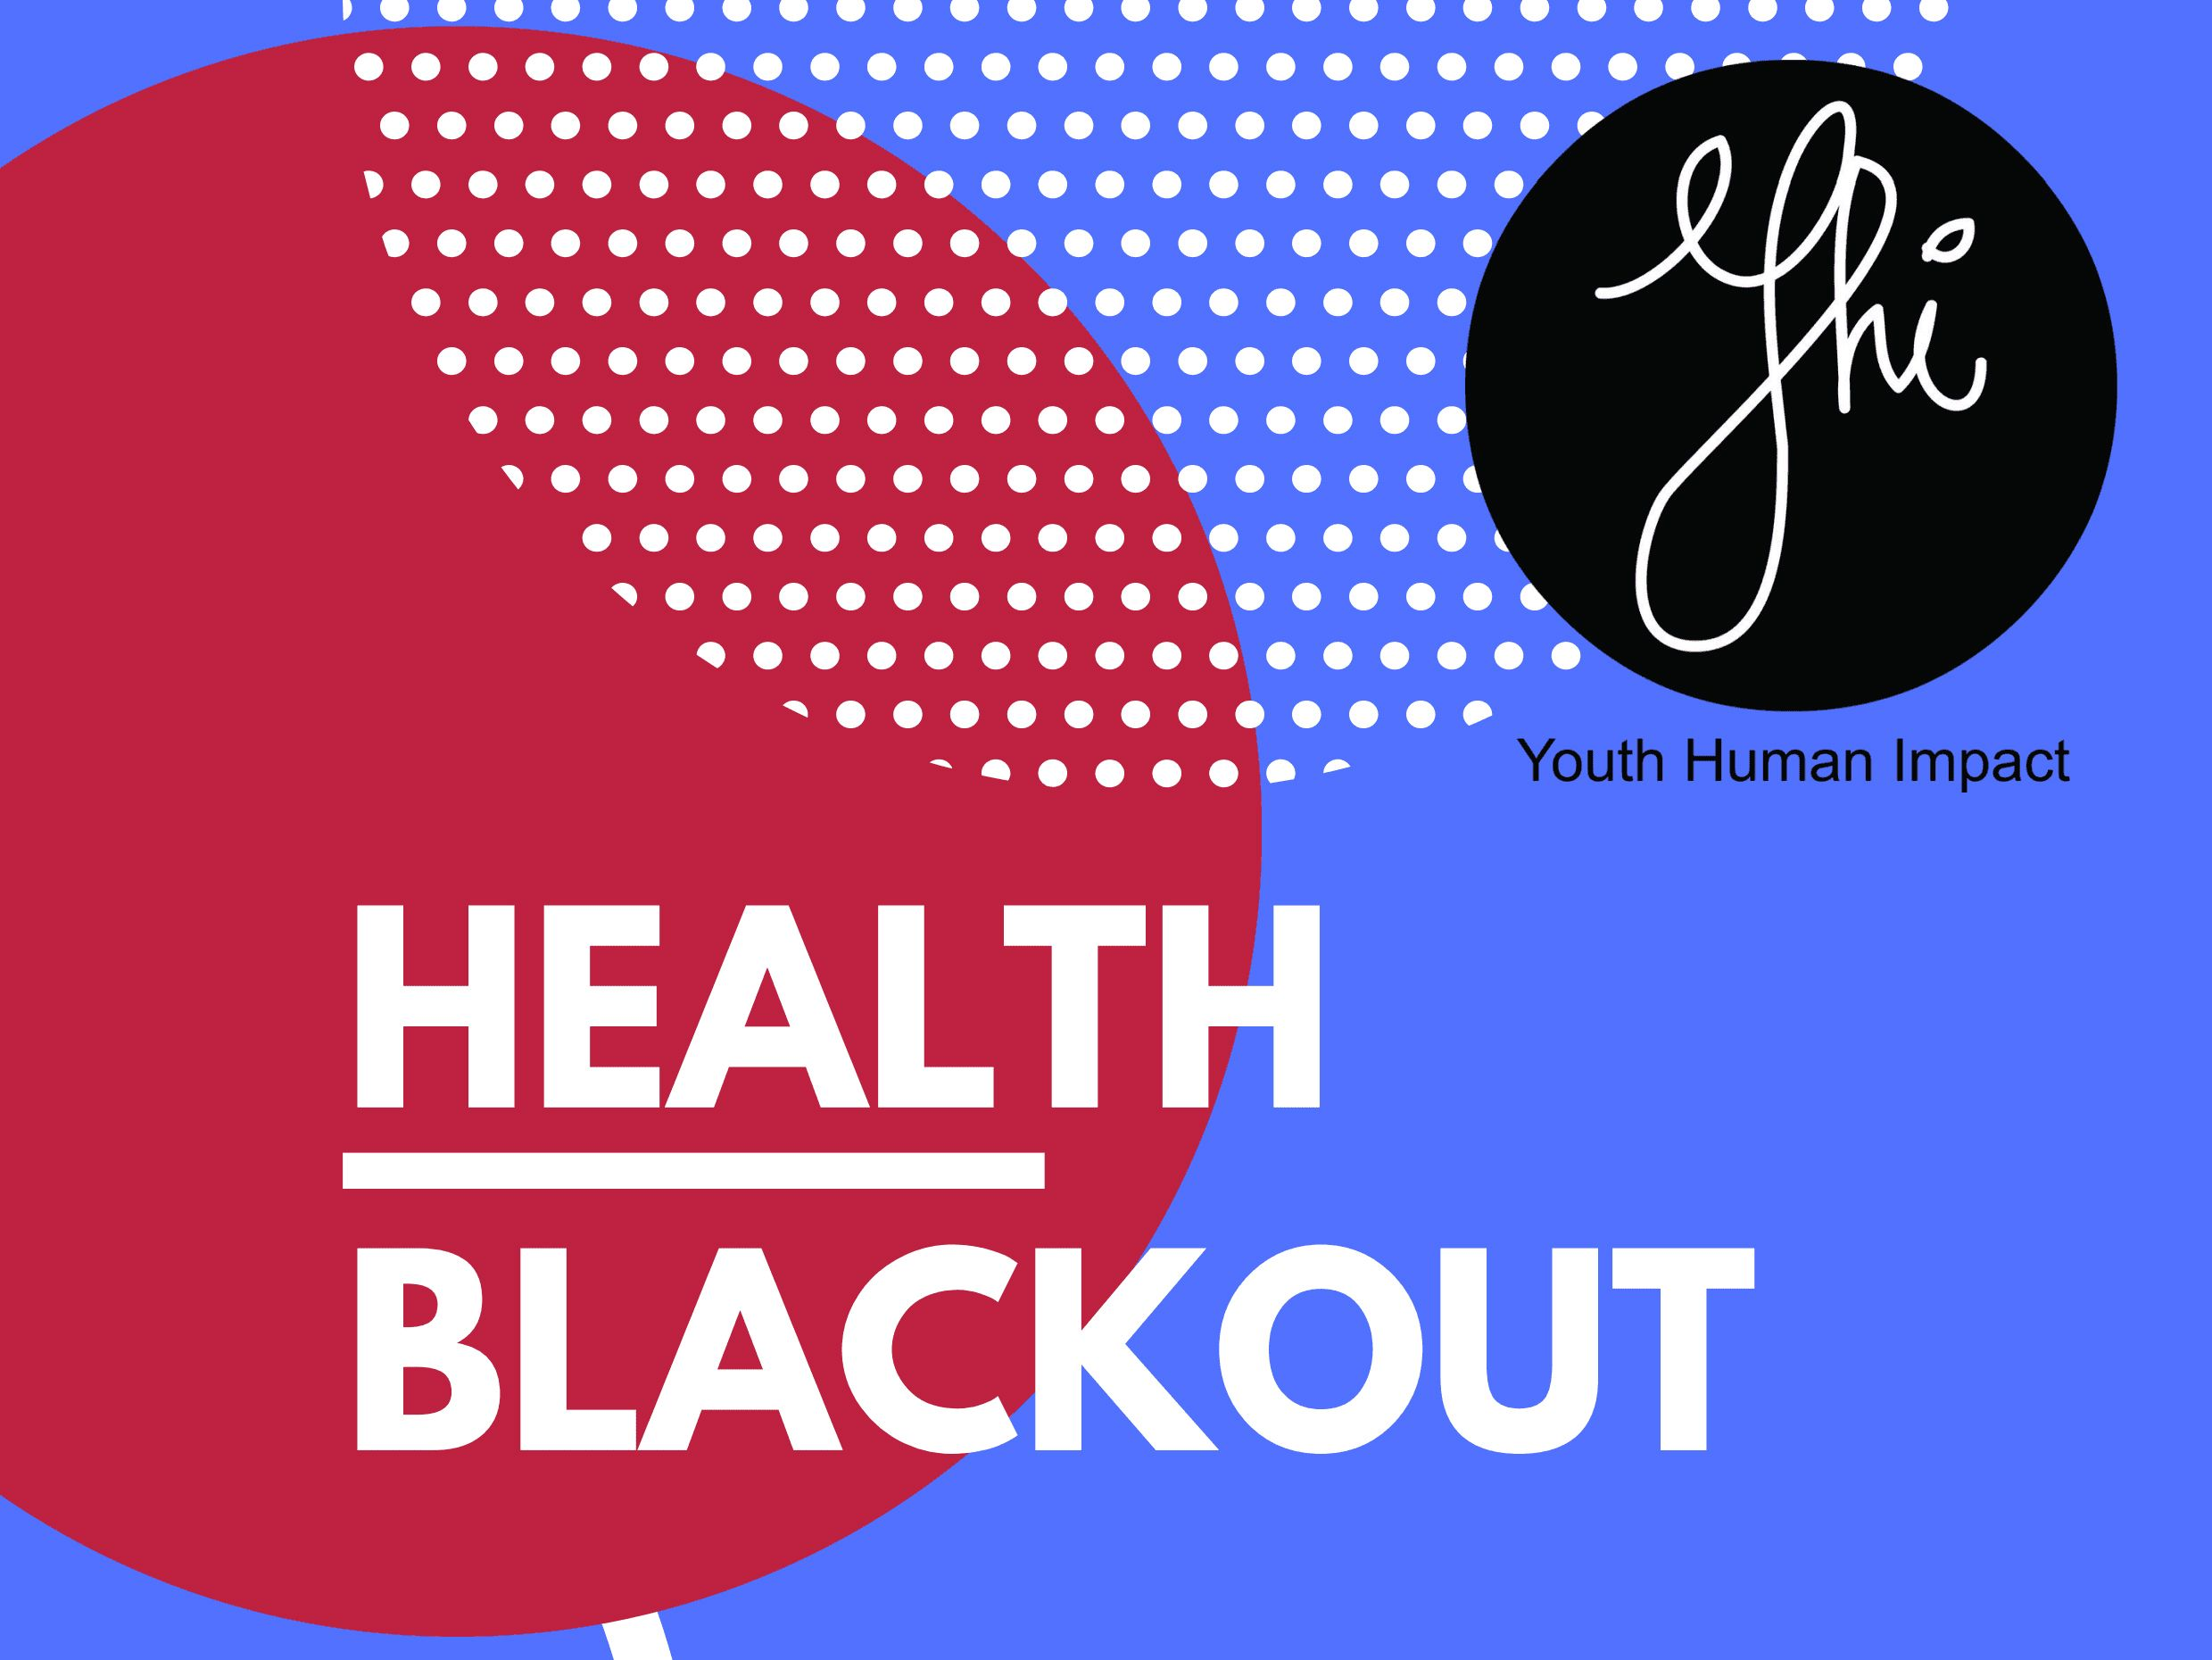 Health Blackout • ETV EuroTreviso